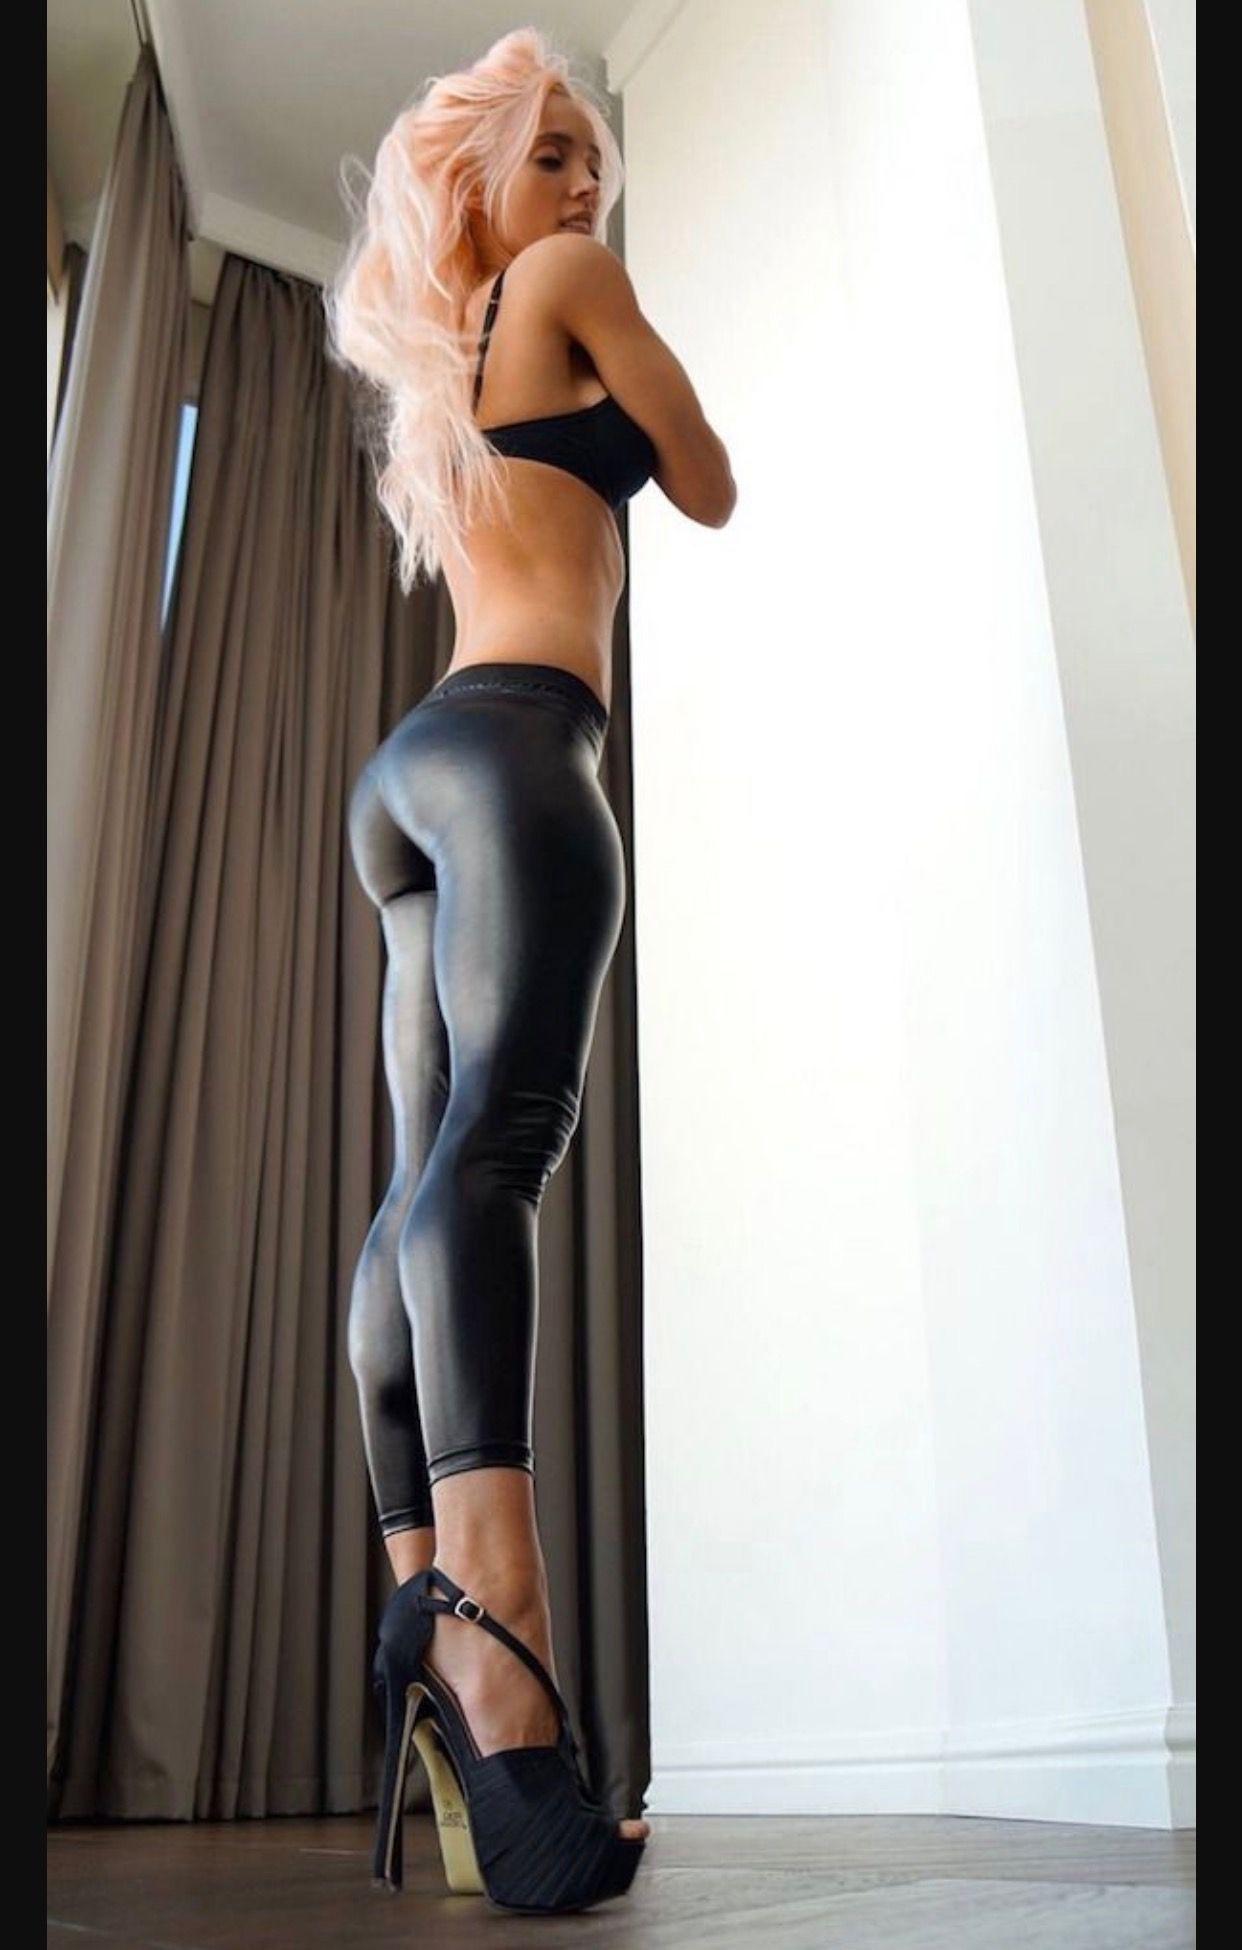 Sexy Older Women Sexy Women Fit Women Tight Leggings Shiny Leggings